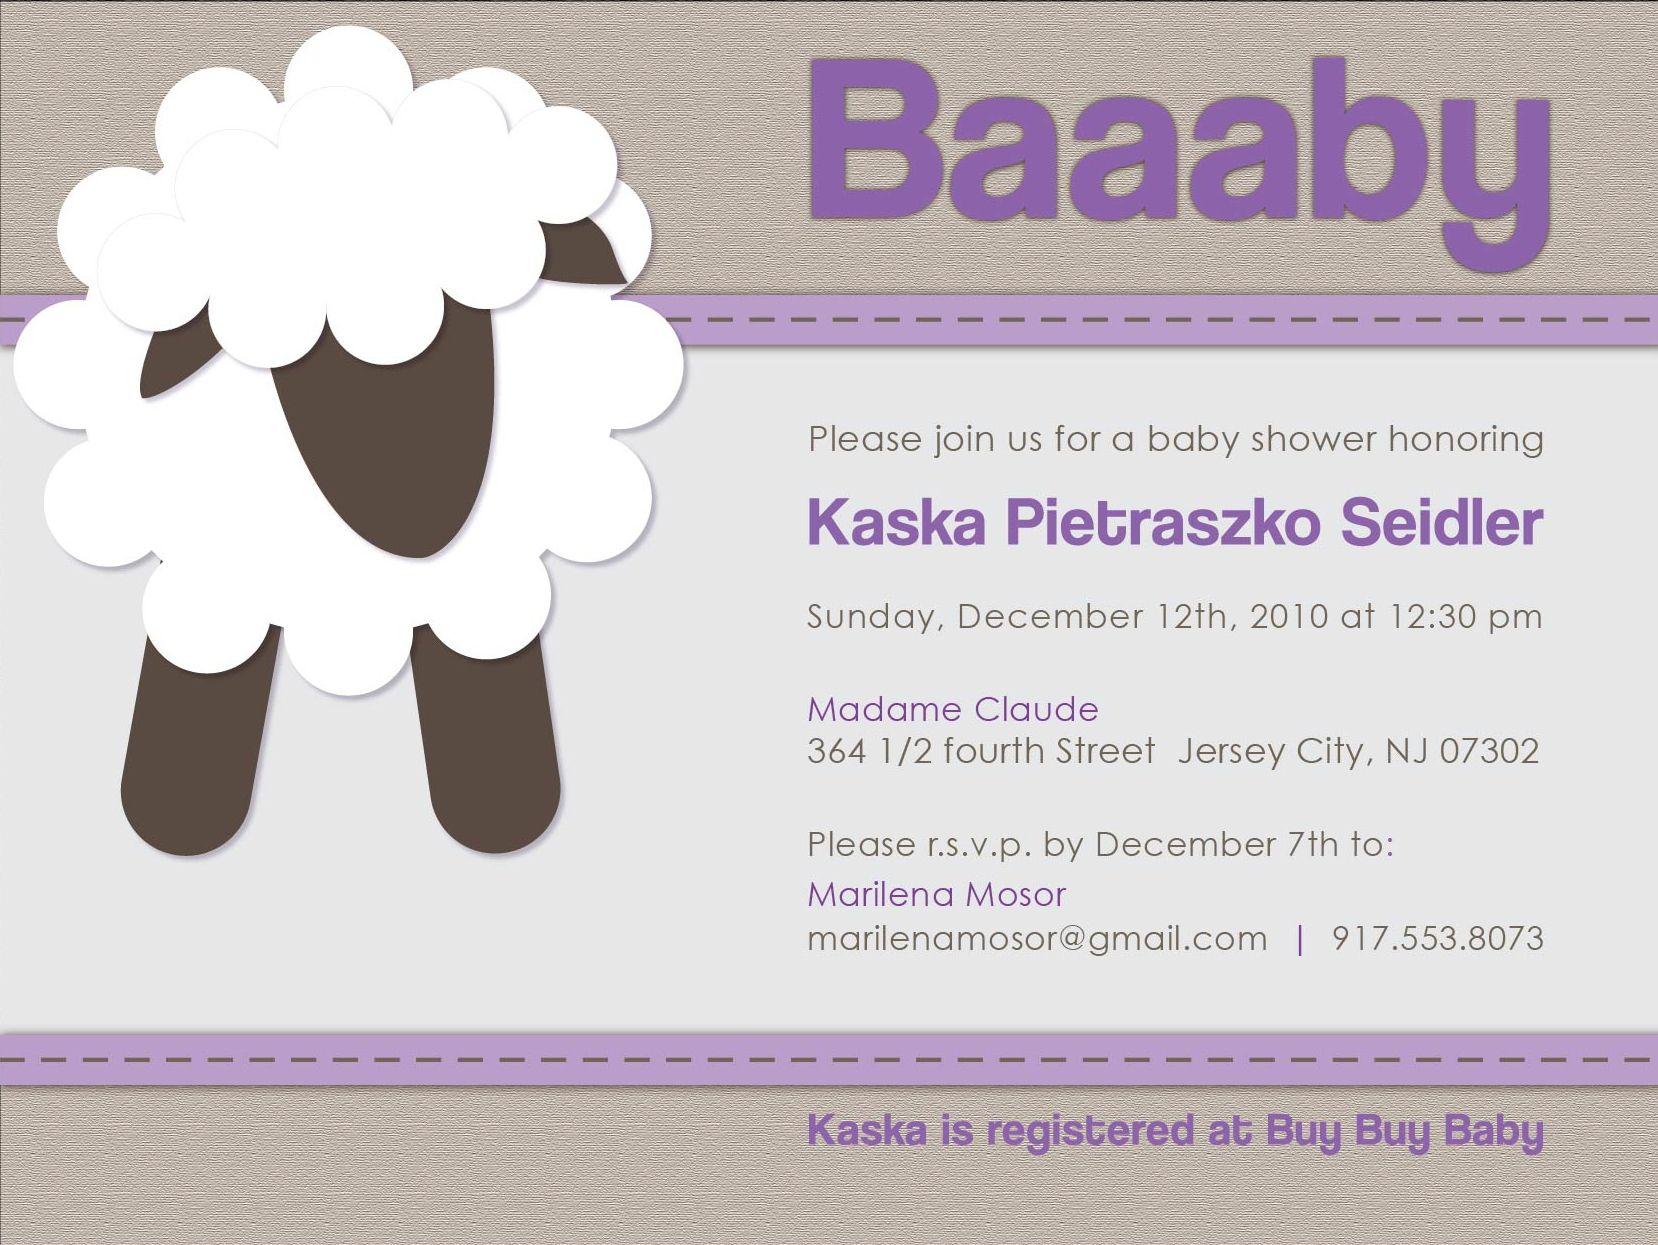 Evite Baby Boy Shower Invitations | http://atwebry.info | Pinterest ...